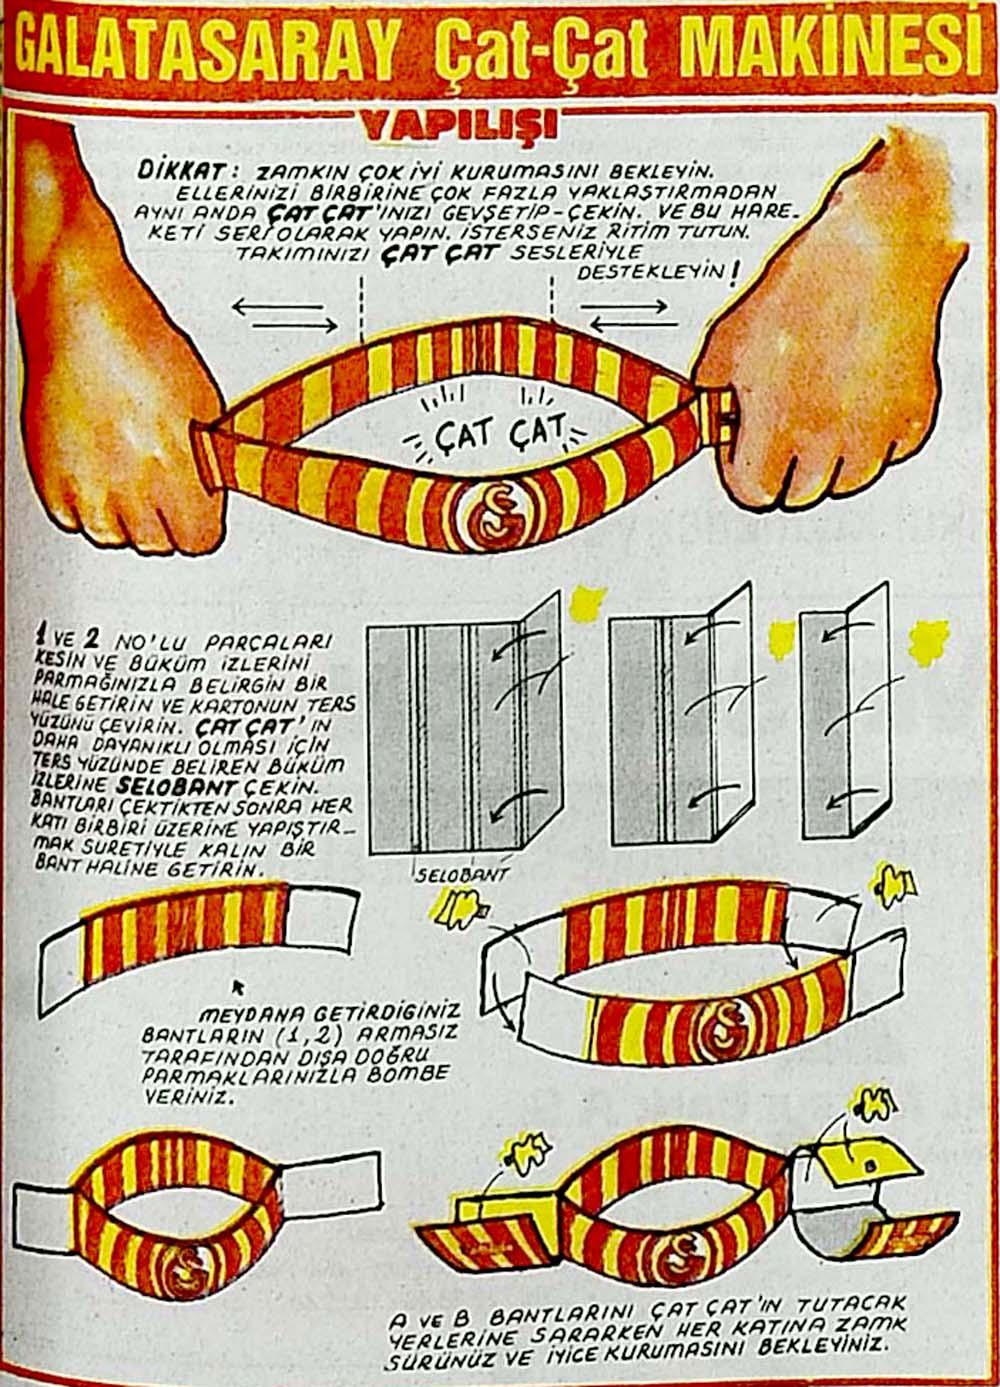 Galatasaray Çat-Çat Makinesi